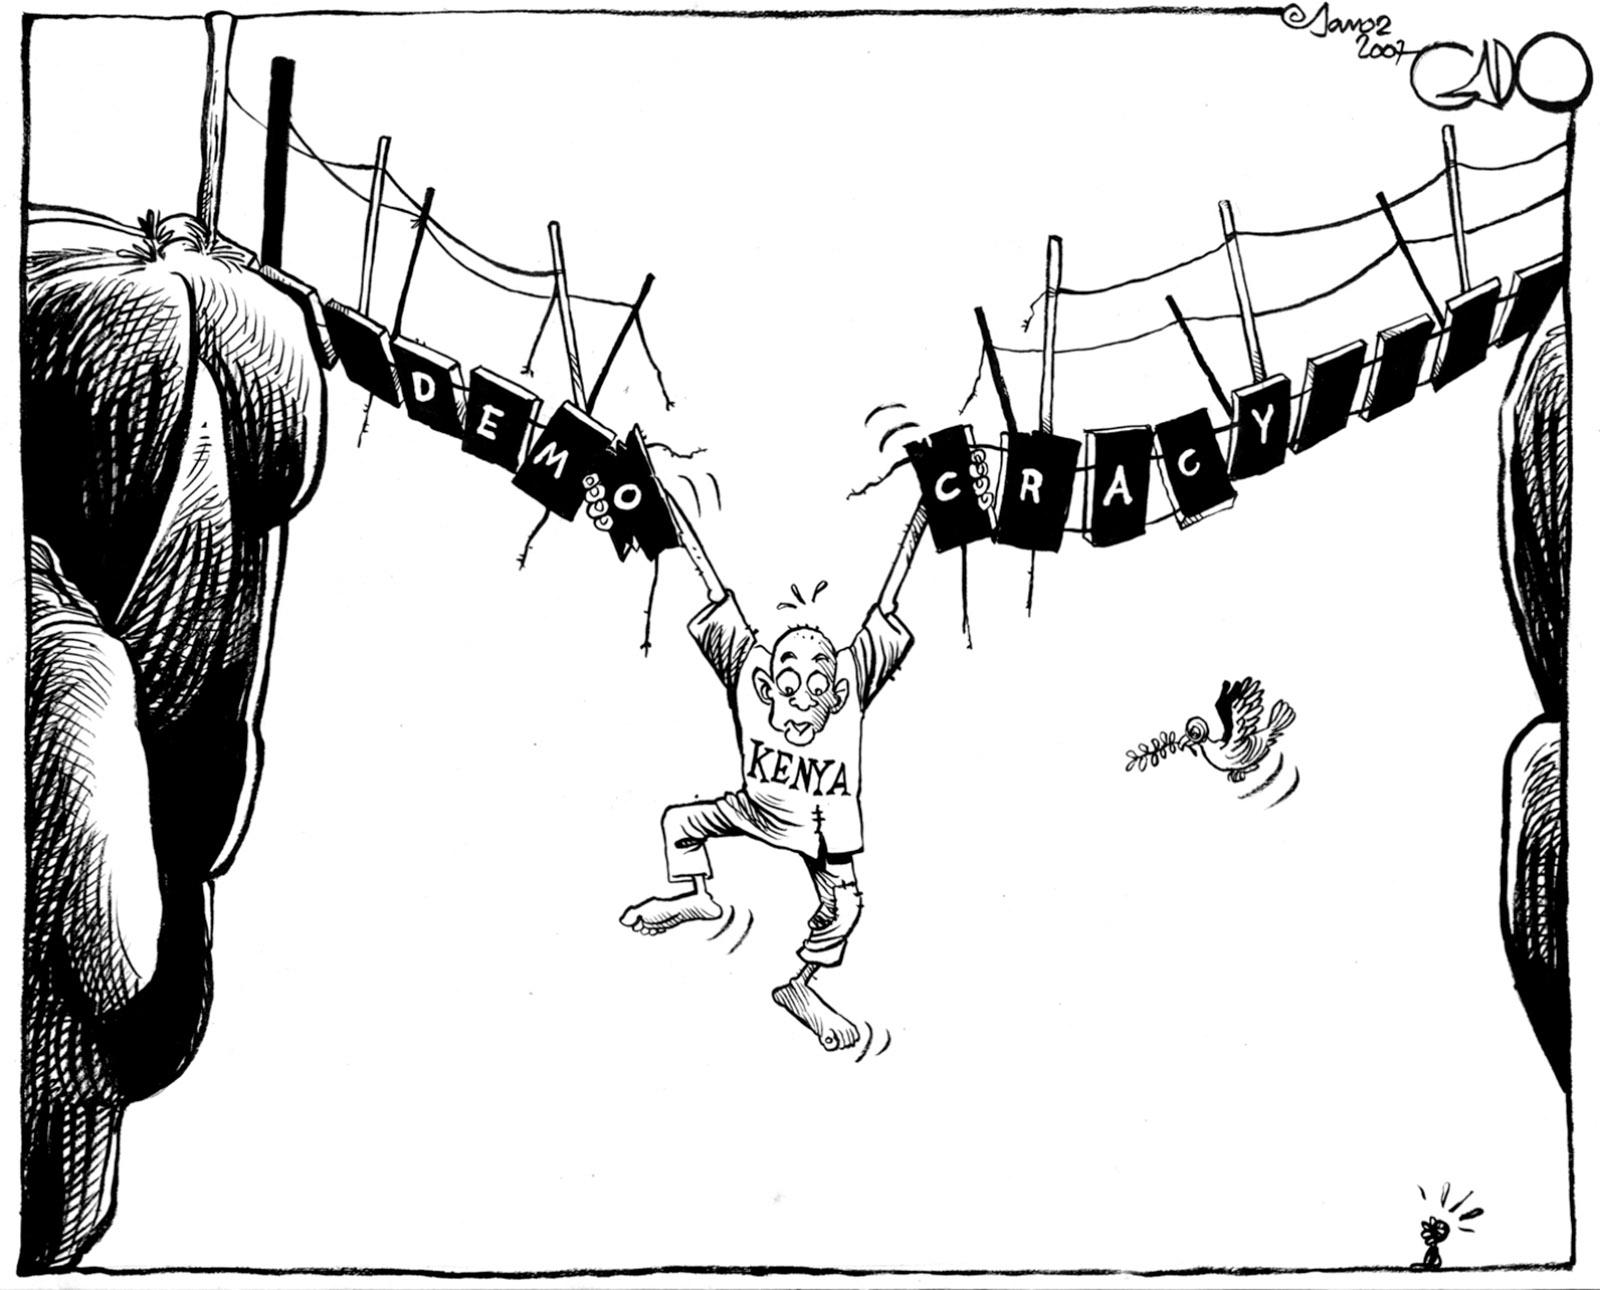 'Kenya's Democracy'; drawing by Gado, January 2007